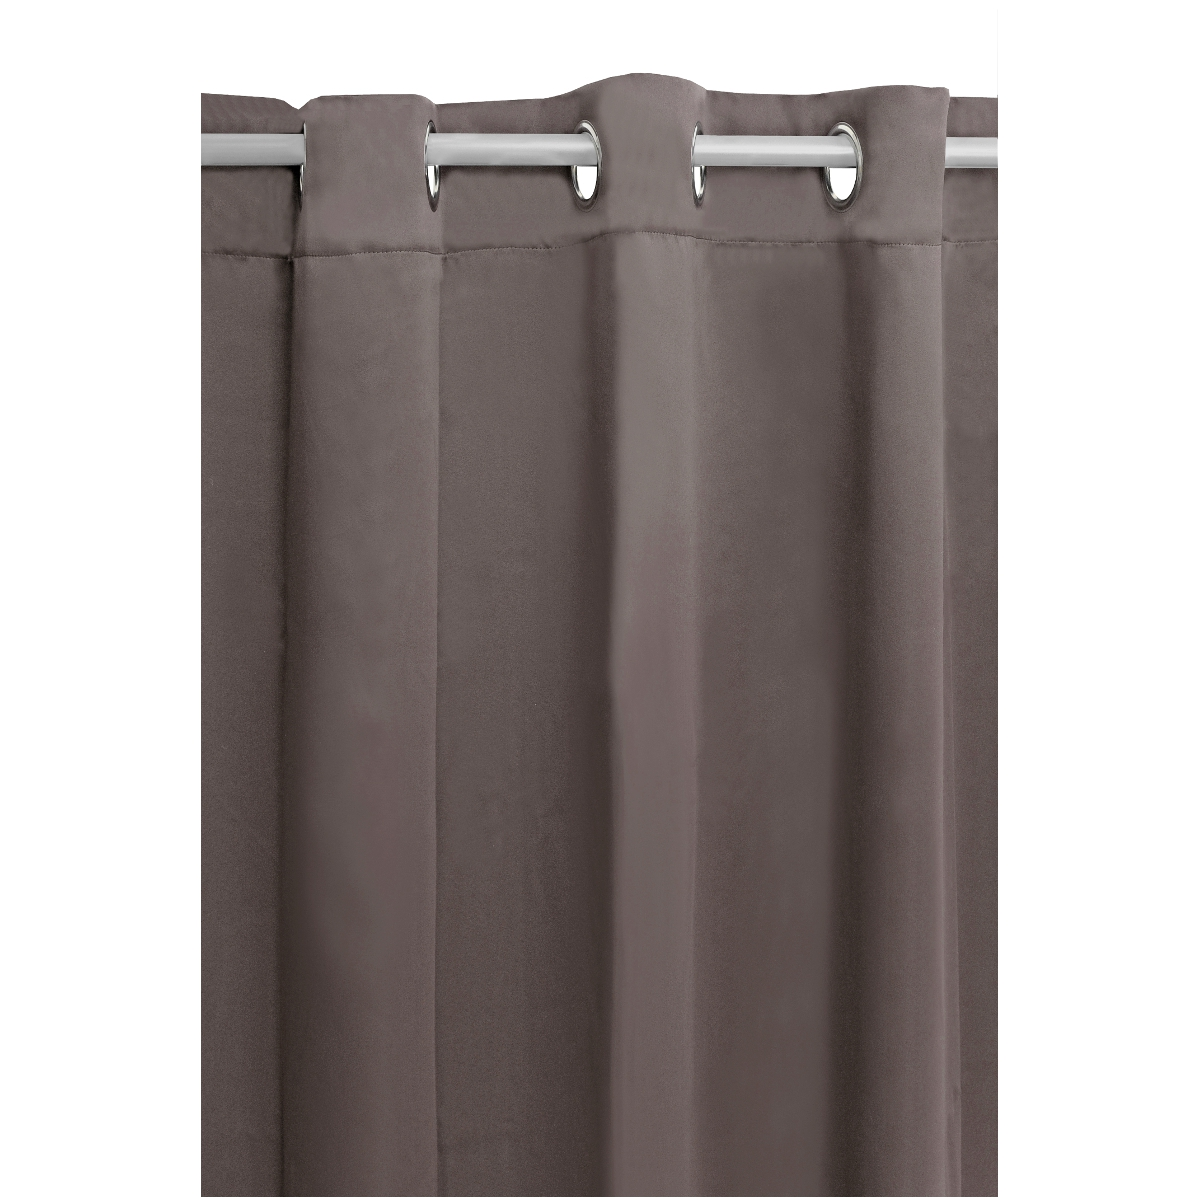 vorhang gardine blickdicht senschal dekoschal sen in taupe. Black Bedroom Furniture Sets. Home Design Ideas